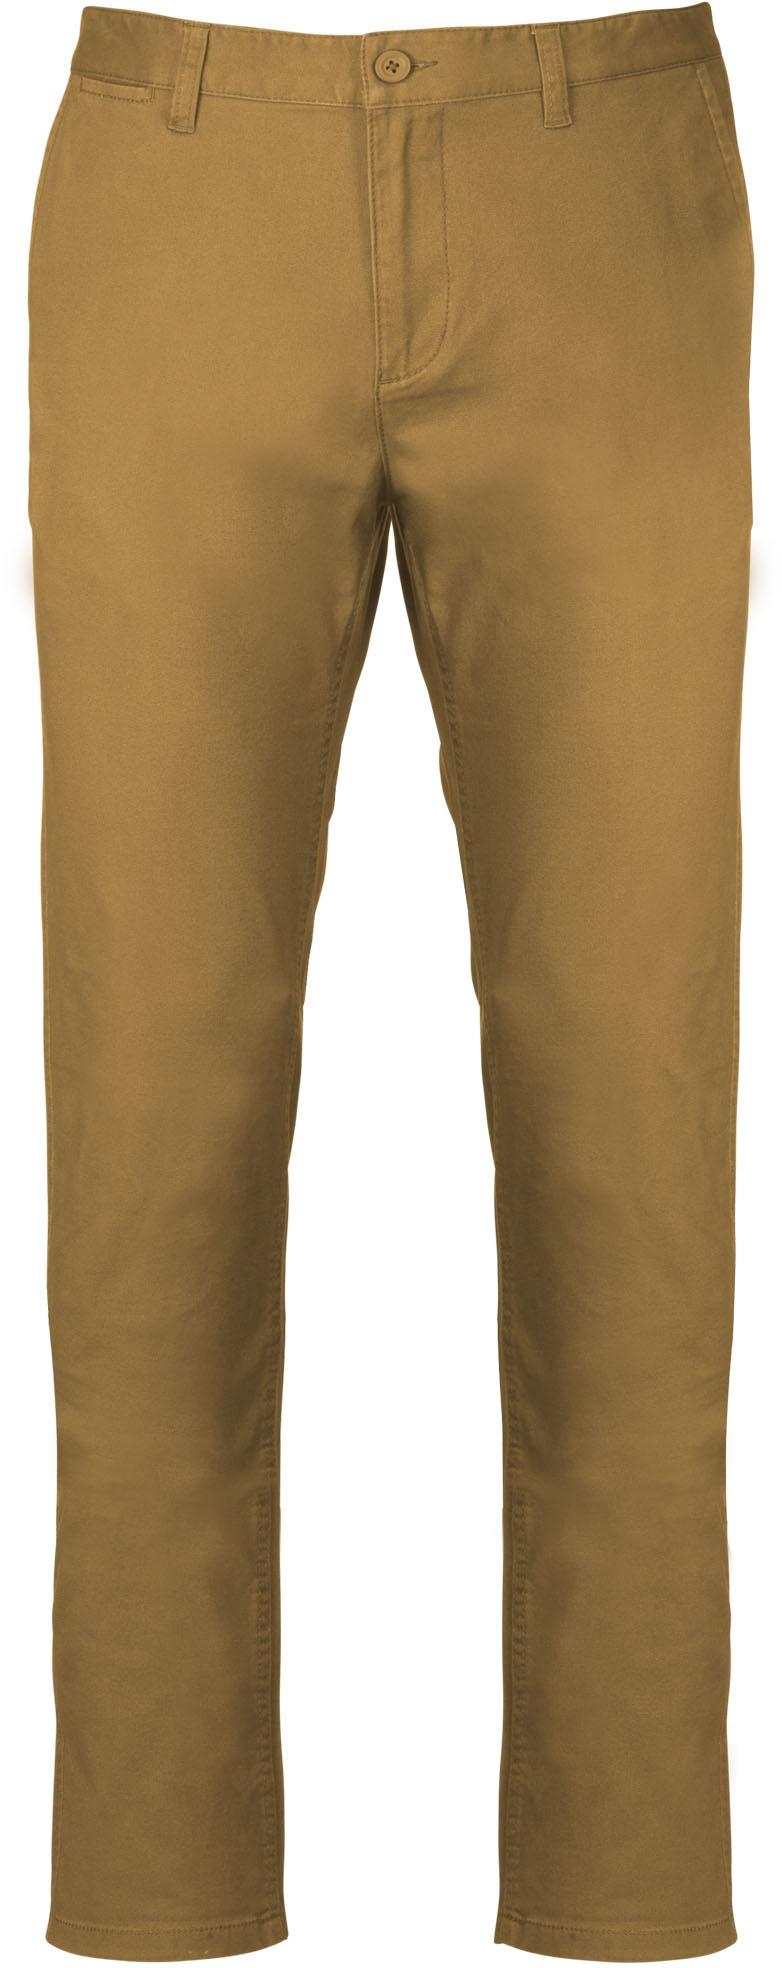 Pantalon chino homme - 2-1478-5